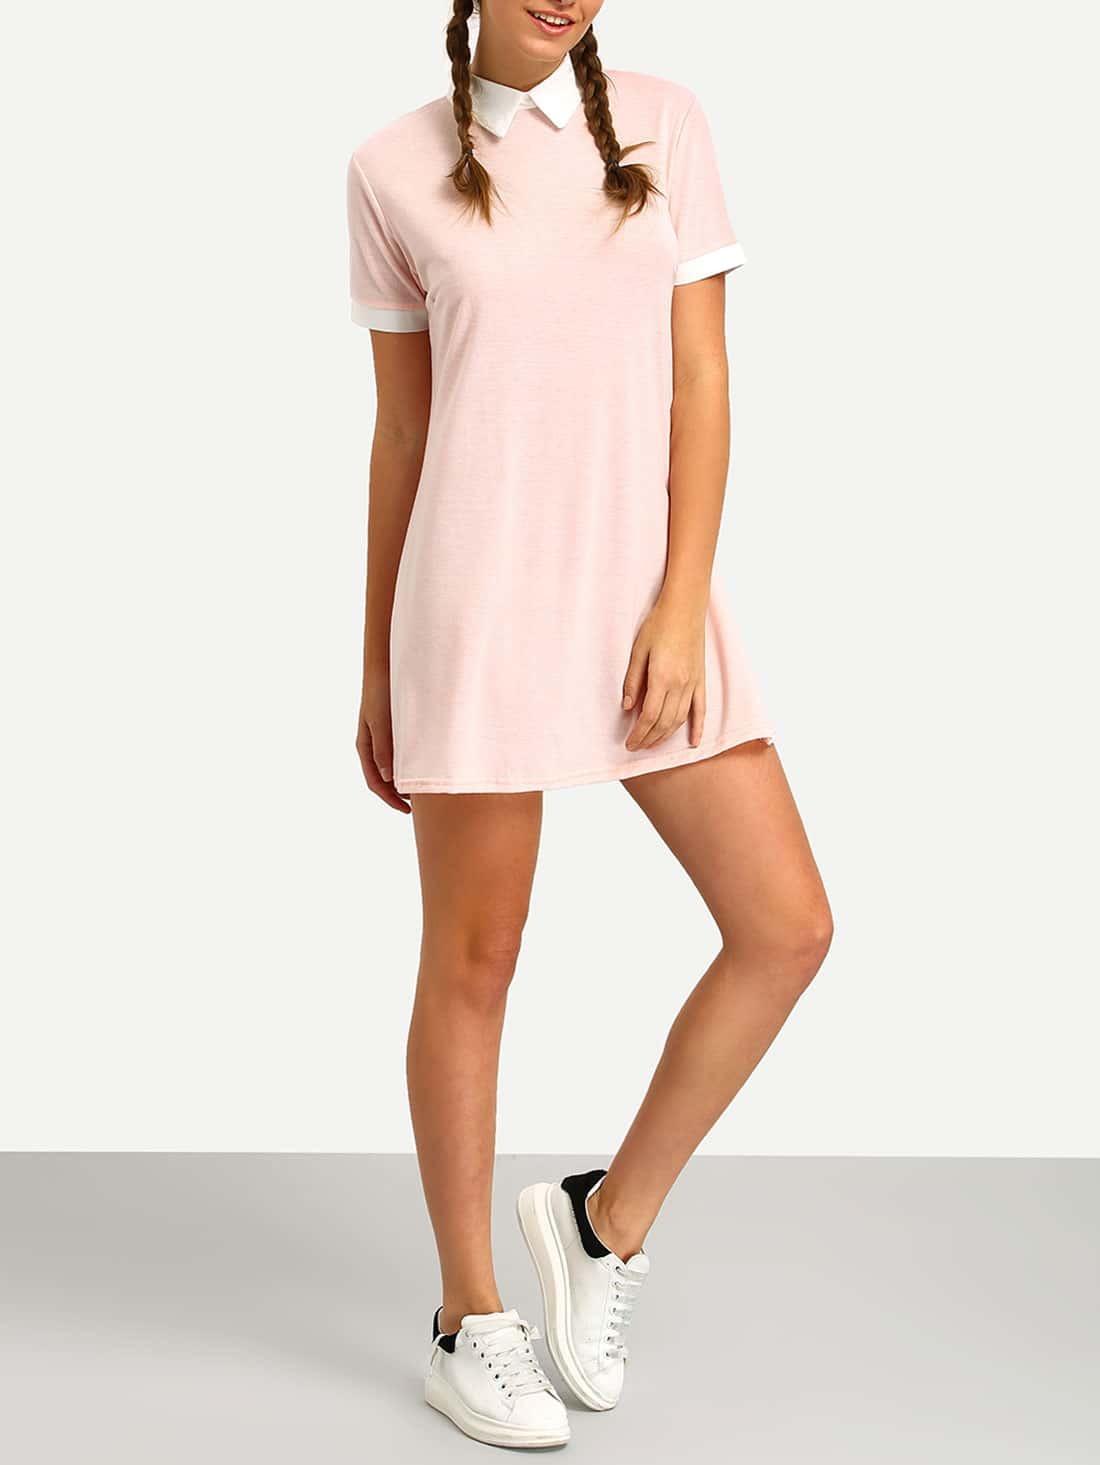 pink contrast collar shirt dress emmacloth women fast fashion online. Black Bedroom Furniture Sets. Home Design Ideas